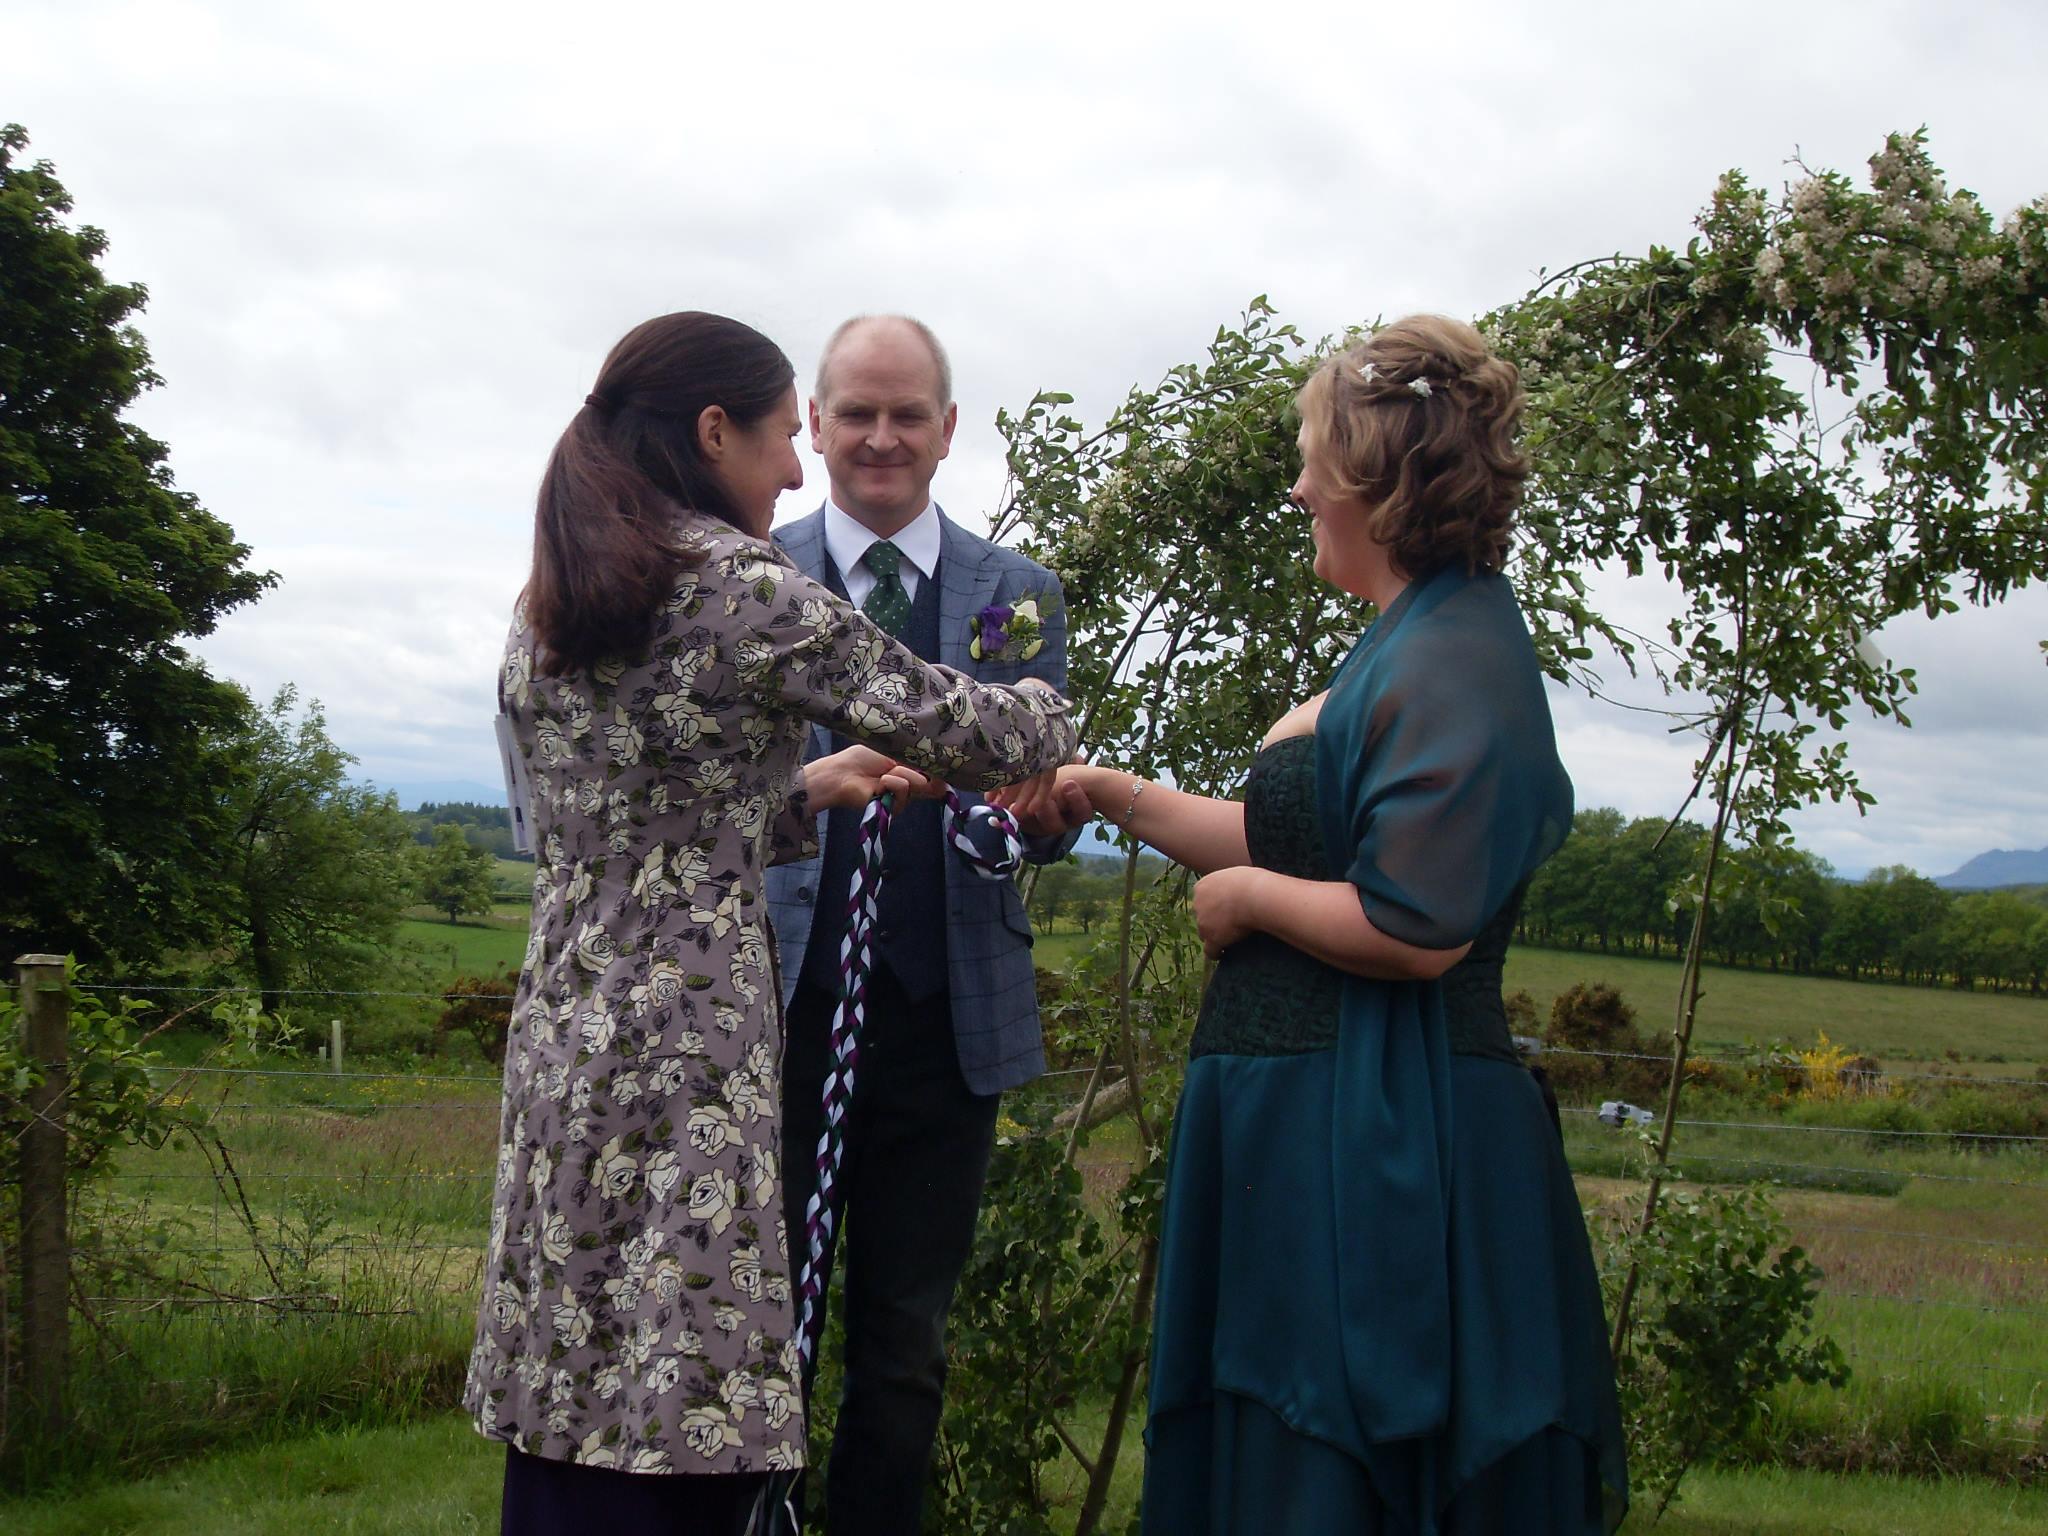 Beautiful Scottish Handfasting Ceremony conducted by Onie Tibbitt, Wedding Celebrant.